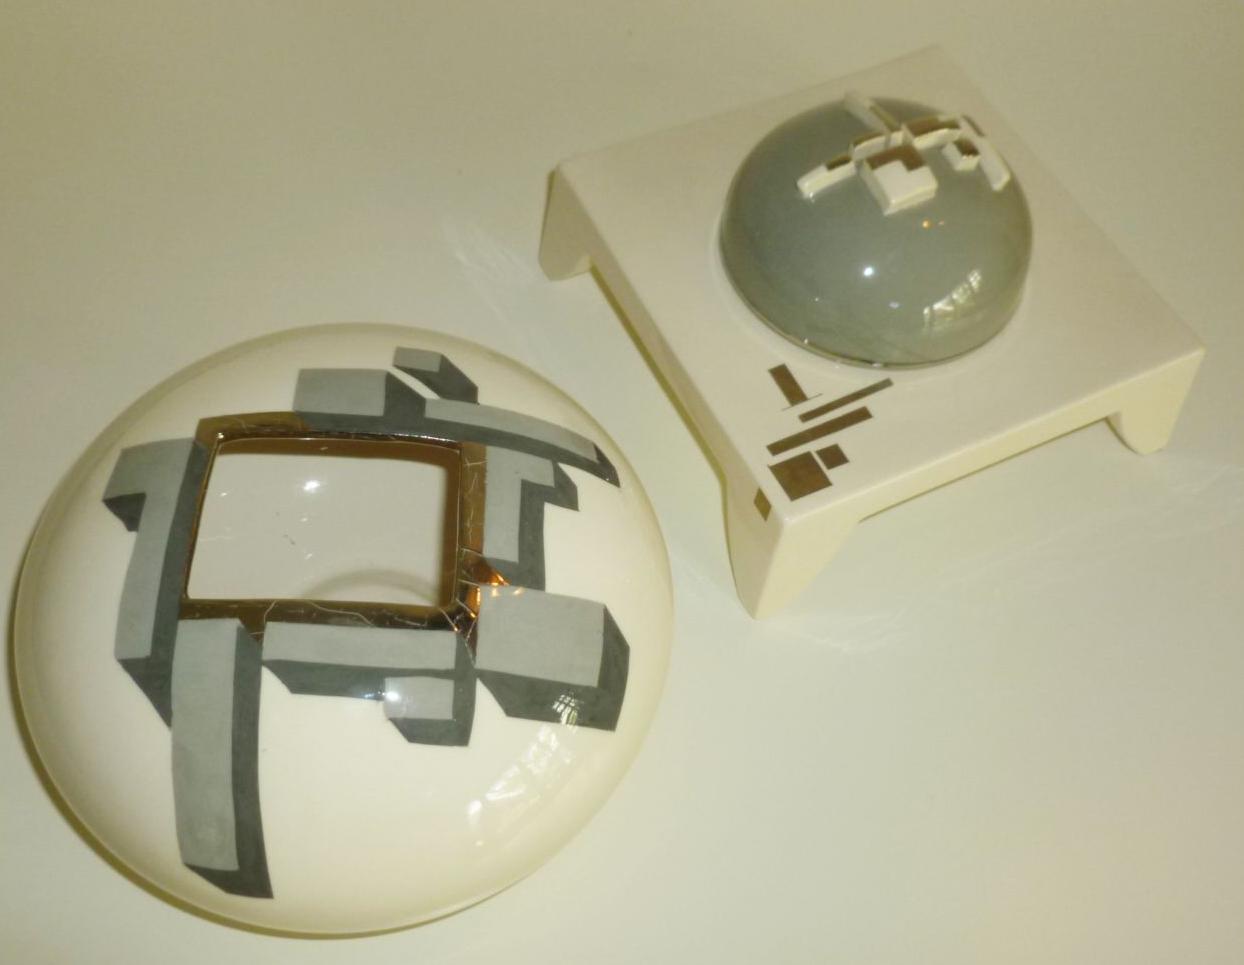 Orb vase with platinum